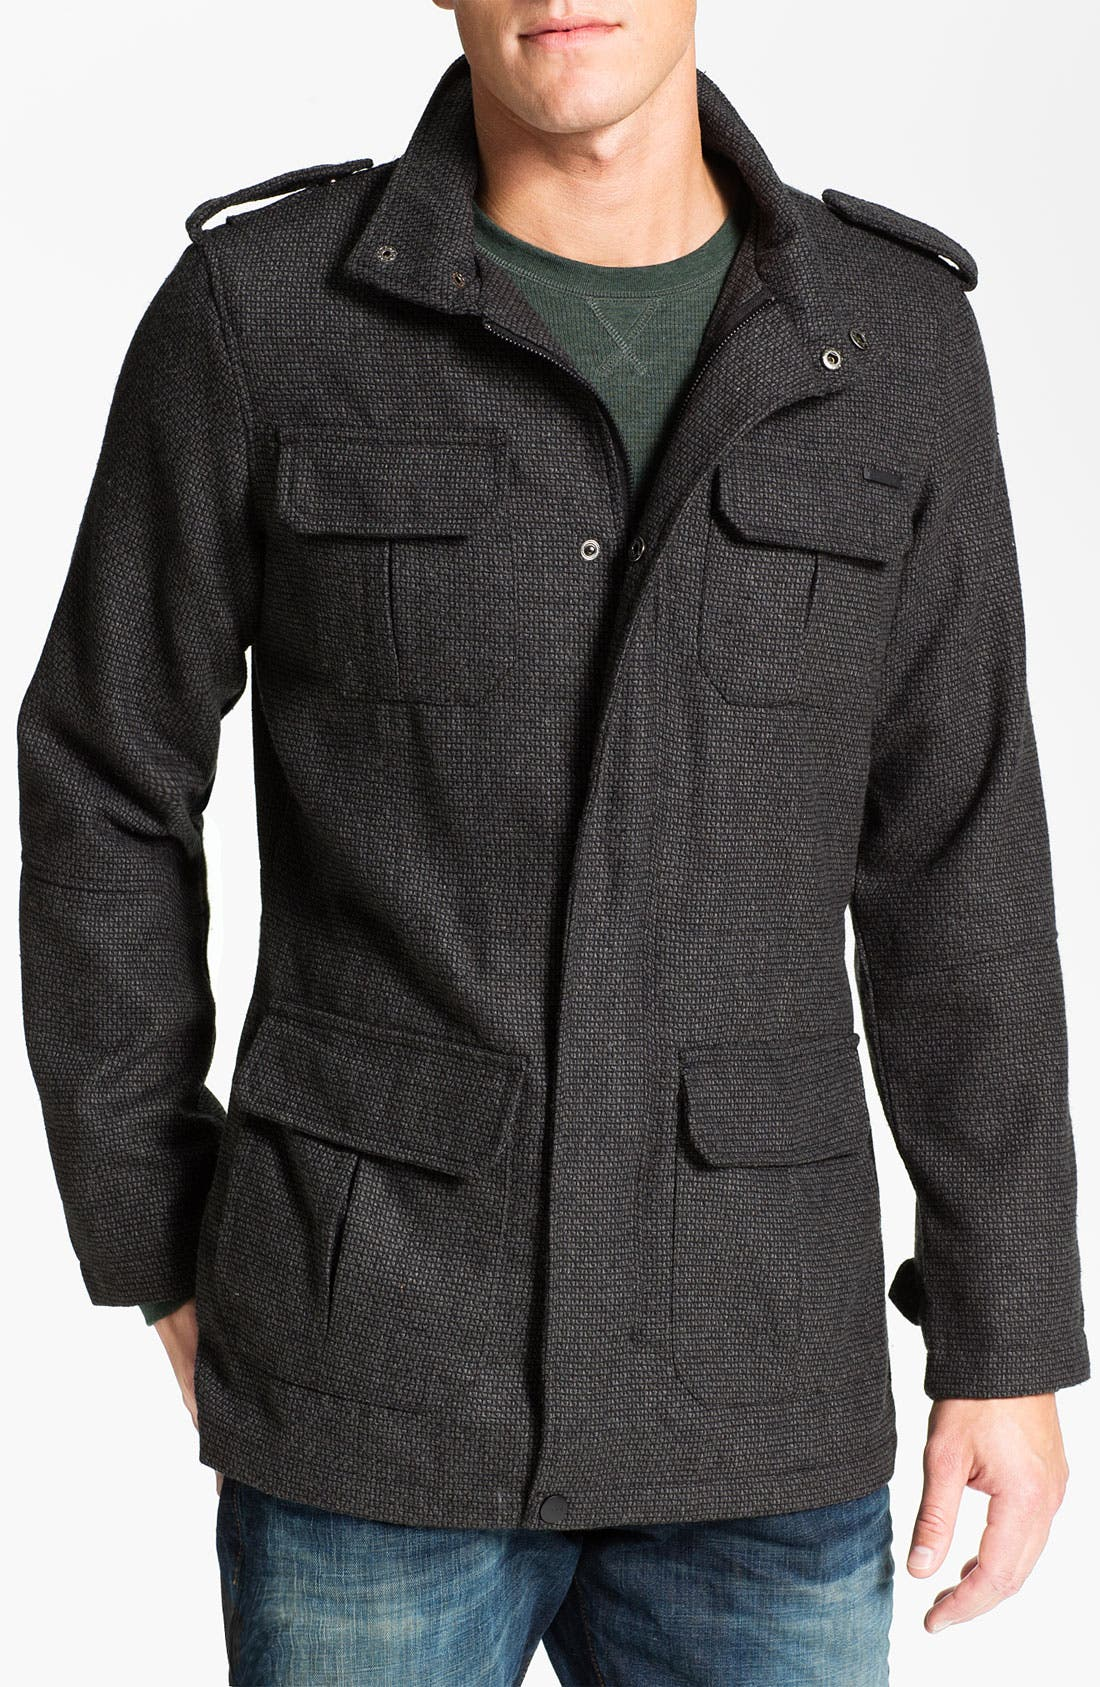 Main Image - Ezekiel 'Predator' Tweed Jacket